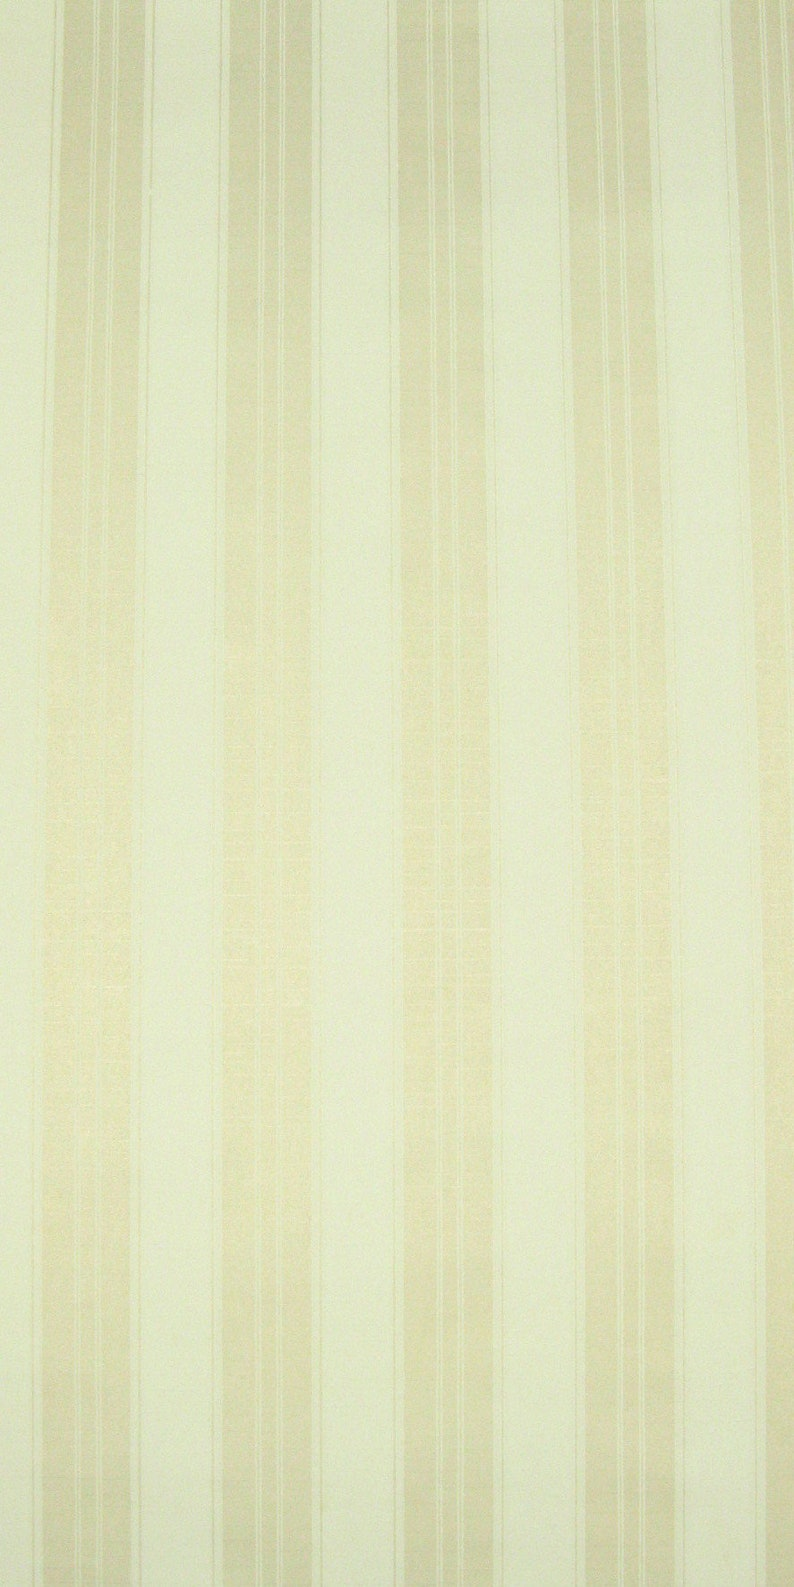 Vintage Wallpaper Salon Creme per meter